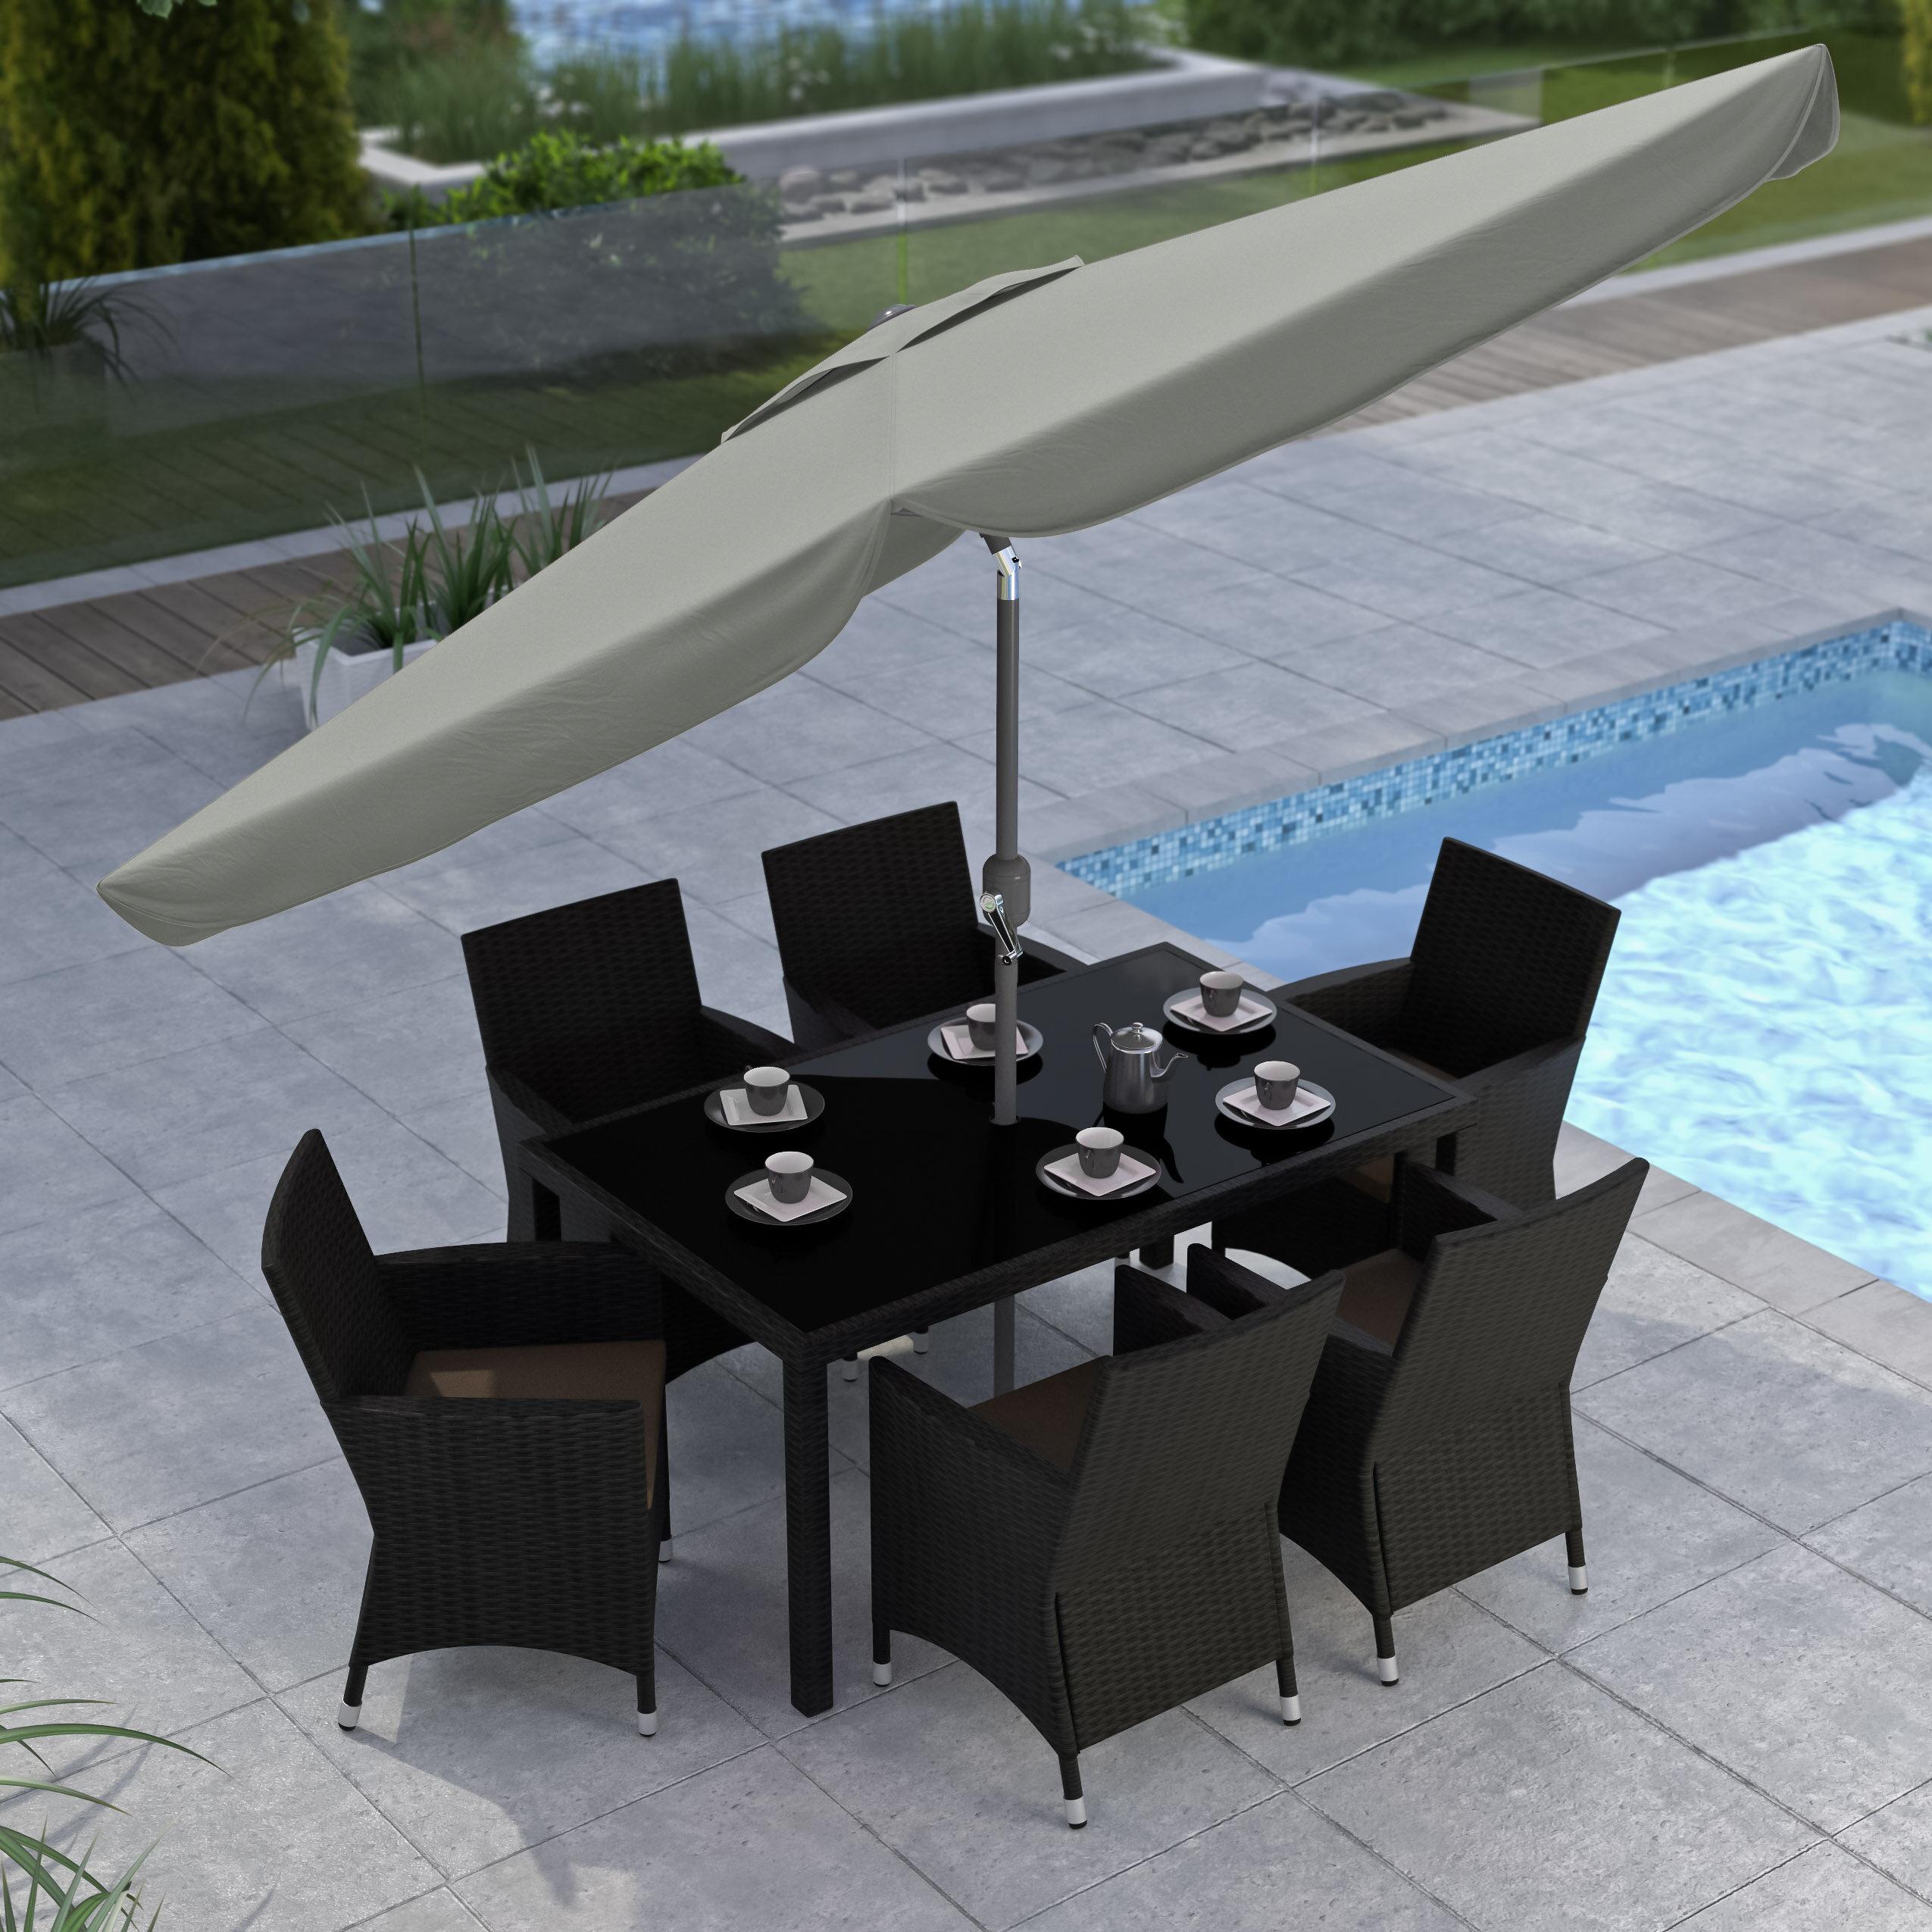 9u0027 Tilting Patio Umbrella